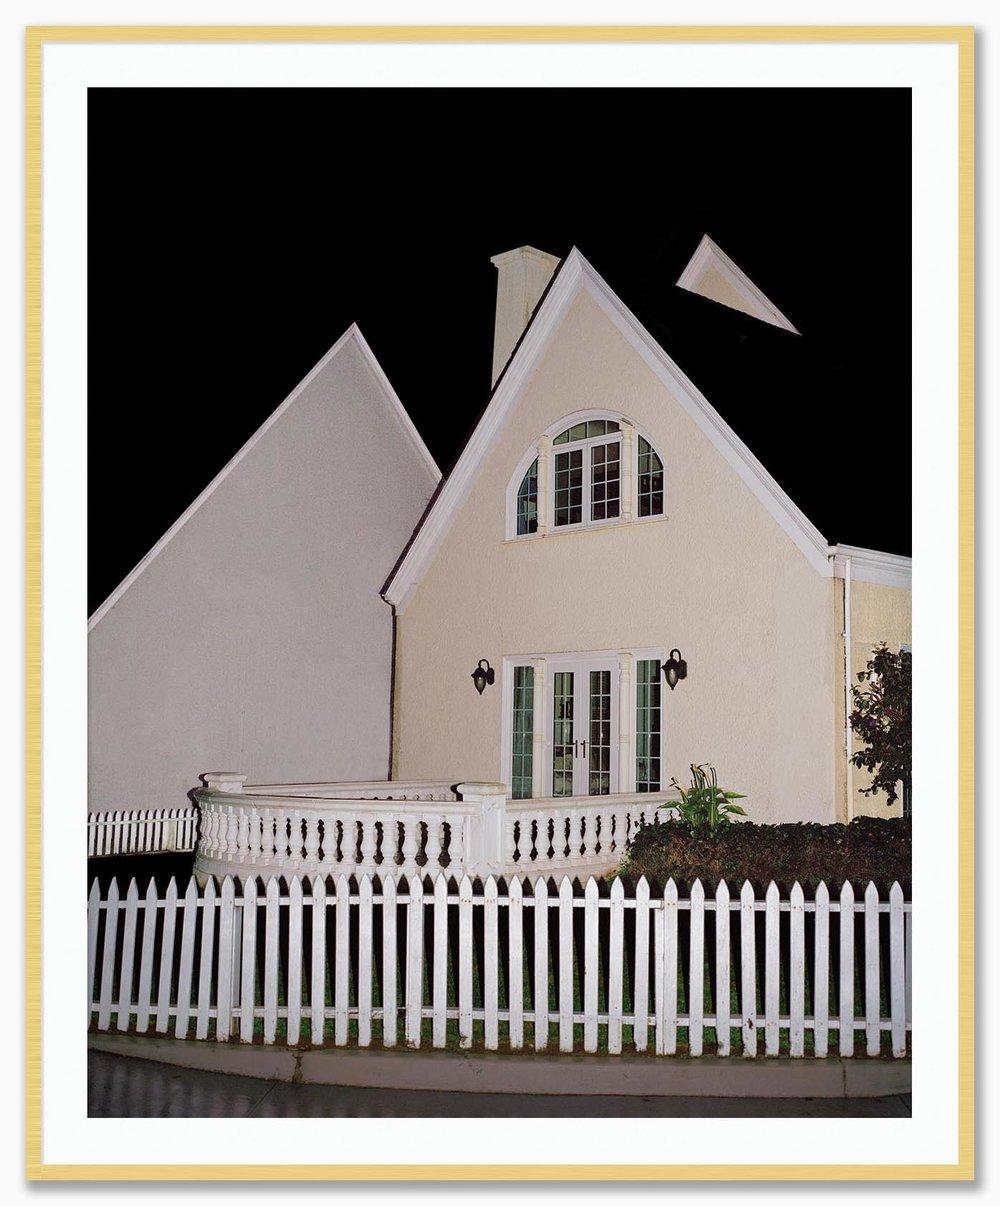 twohouses_Mat_Gold.jpg